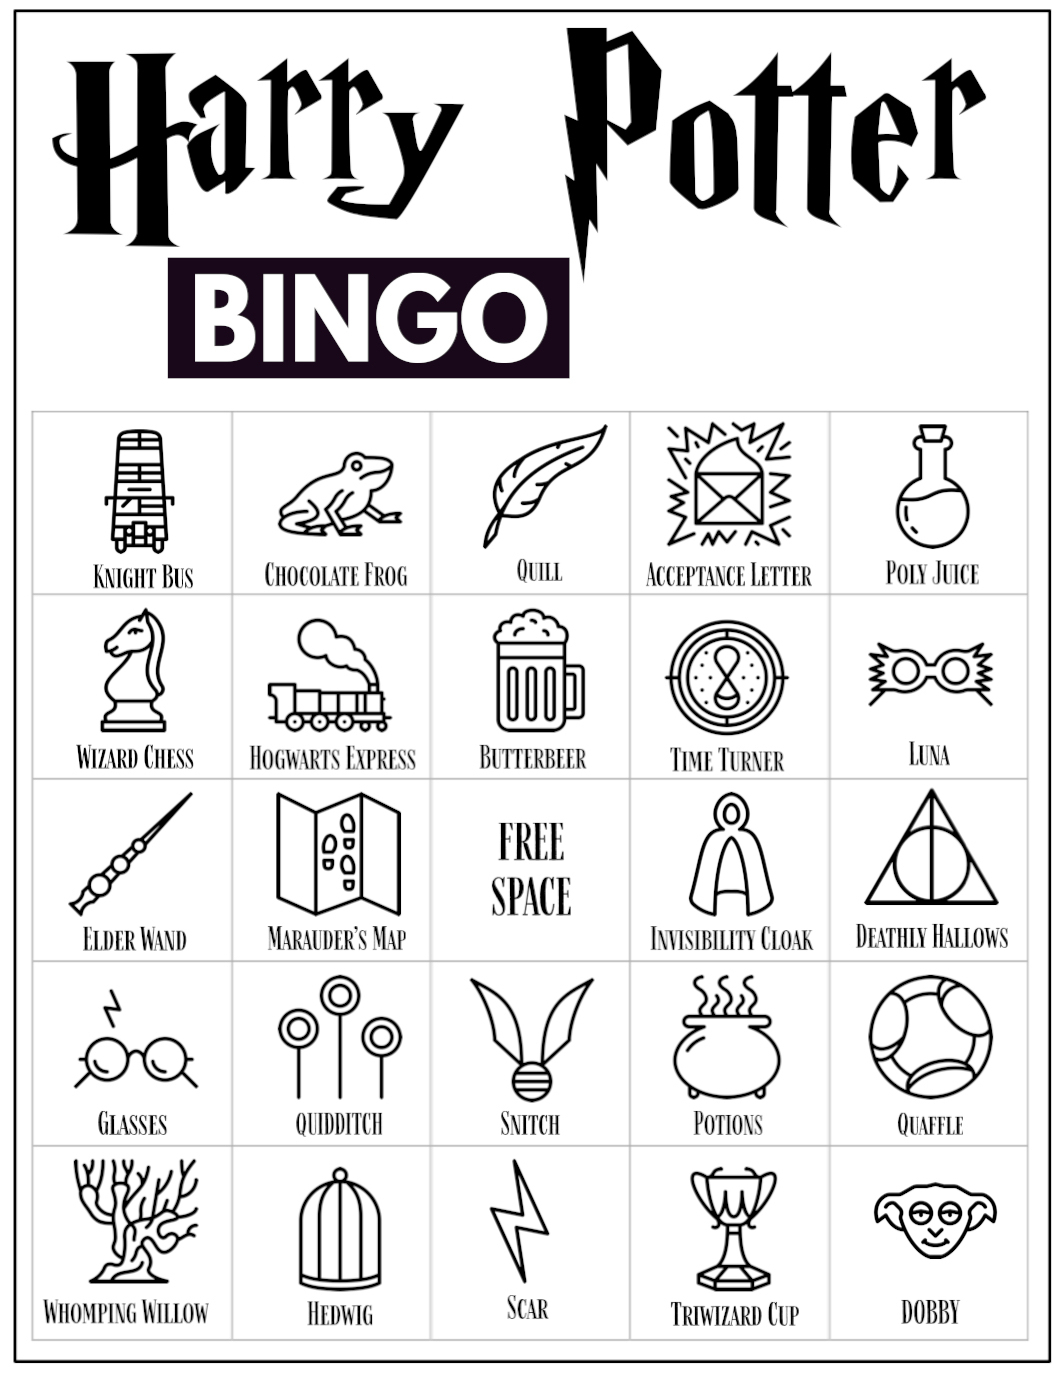 Free Printable Harry Potter Bingo Game - Paper Trail Design